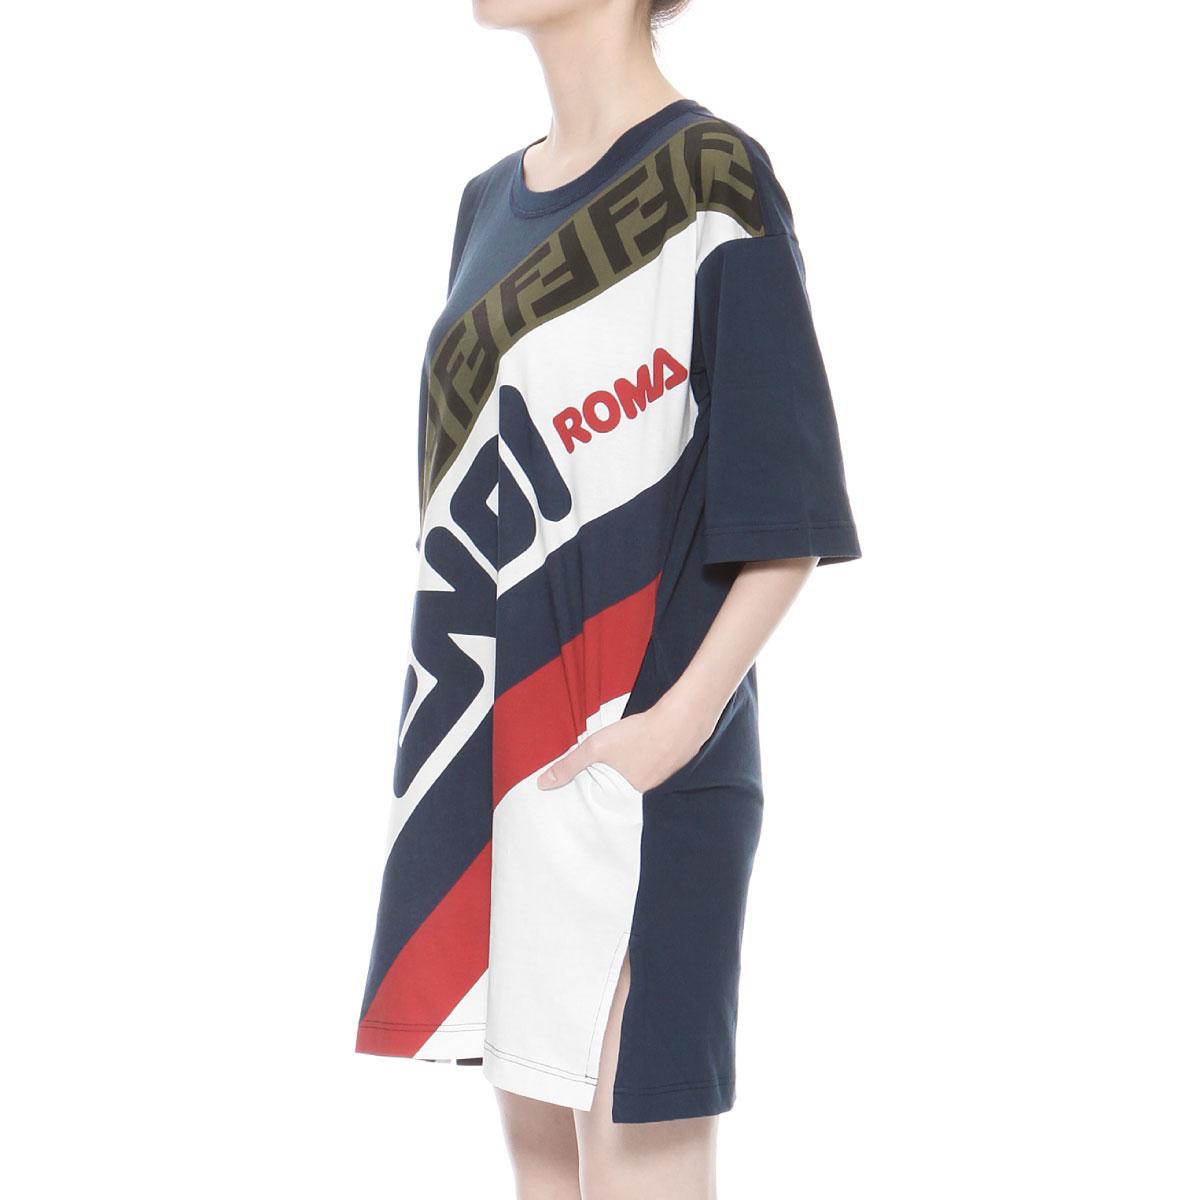 1a16f3e6ece7 importshopdouble  Fendi FENDI T-shirt Lady s FAF100 A6JQ F14PK short ...